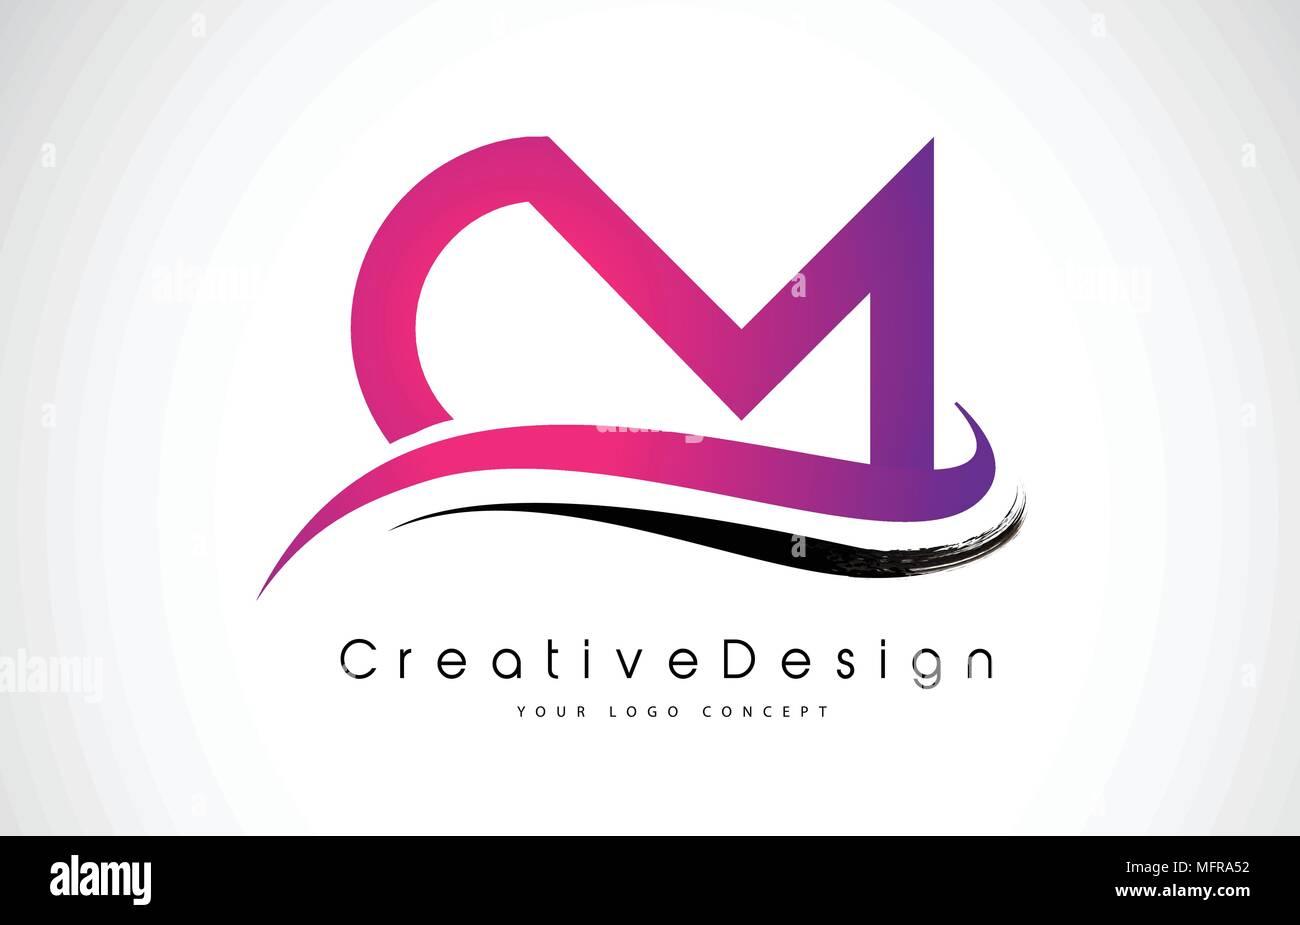 CM C M Letter Logo Design in Black Colors. Creative Modern Letters ...